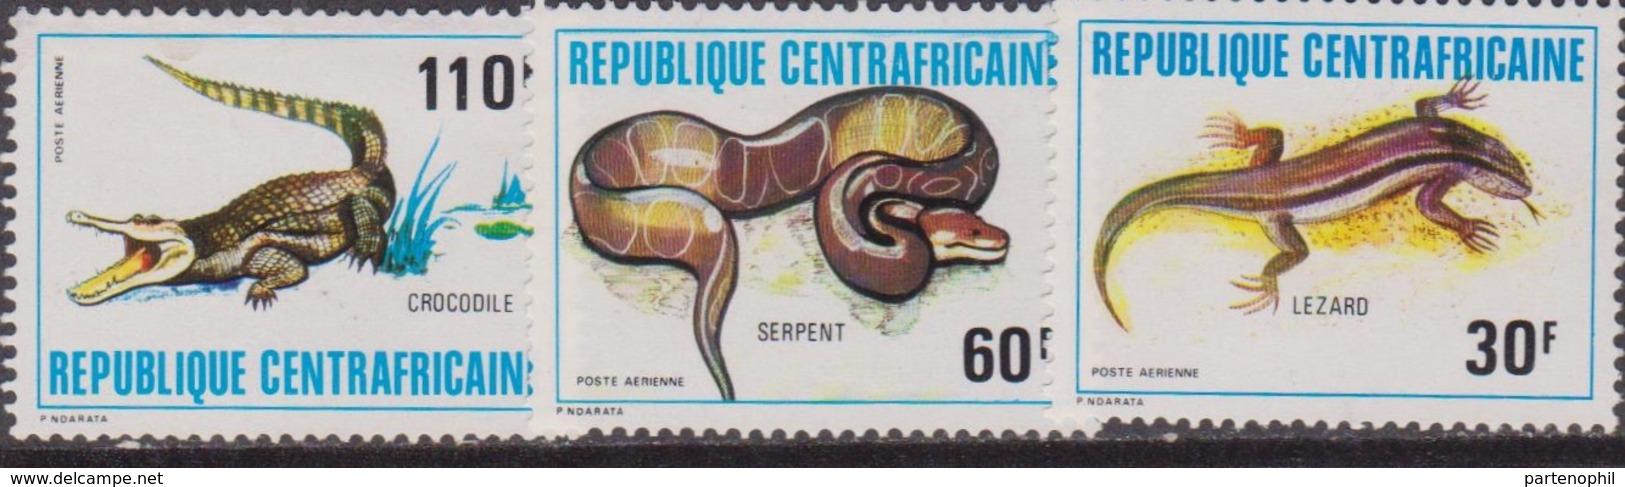 Rep. Centrafricaine Reptiles Snake Set MNH - Repubblica Centroafricana